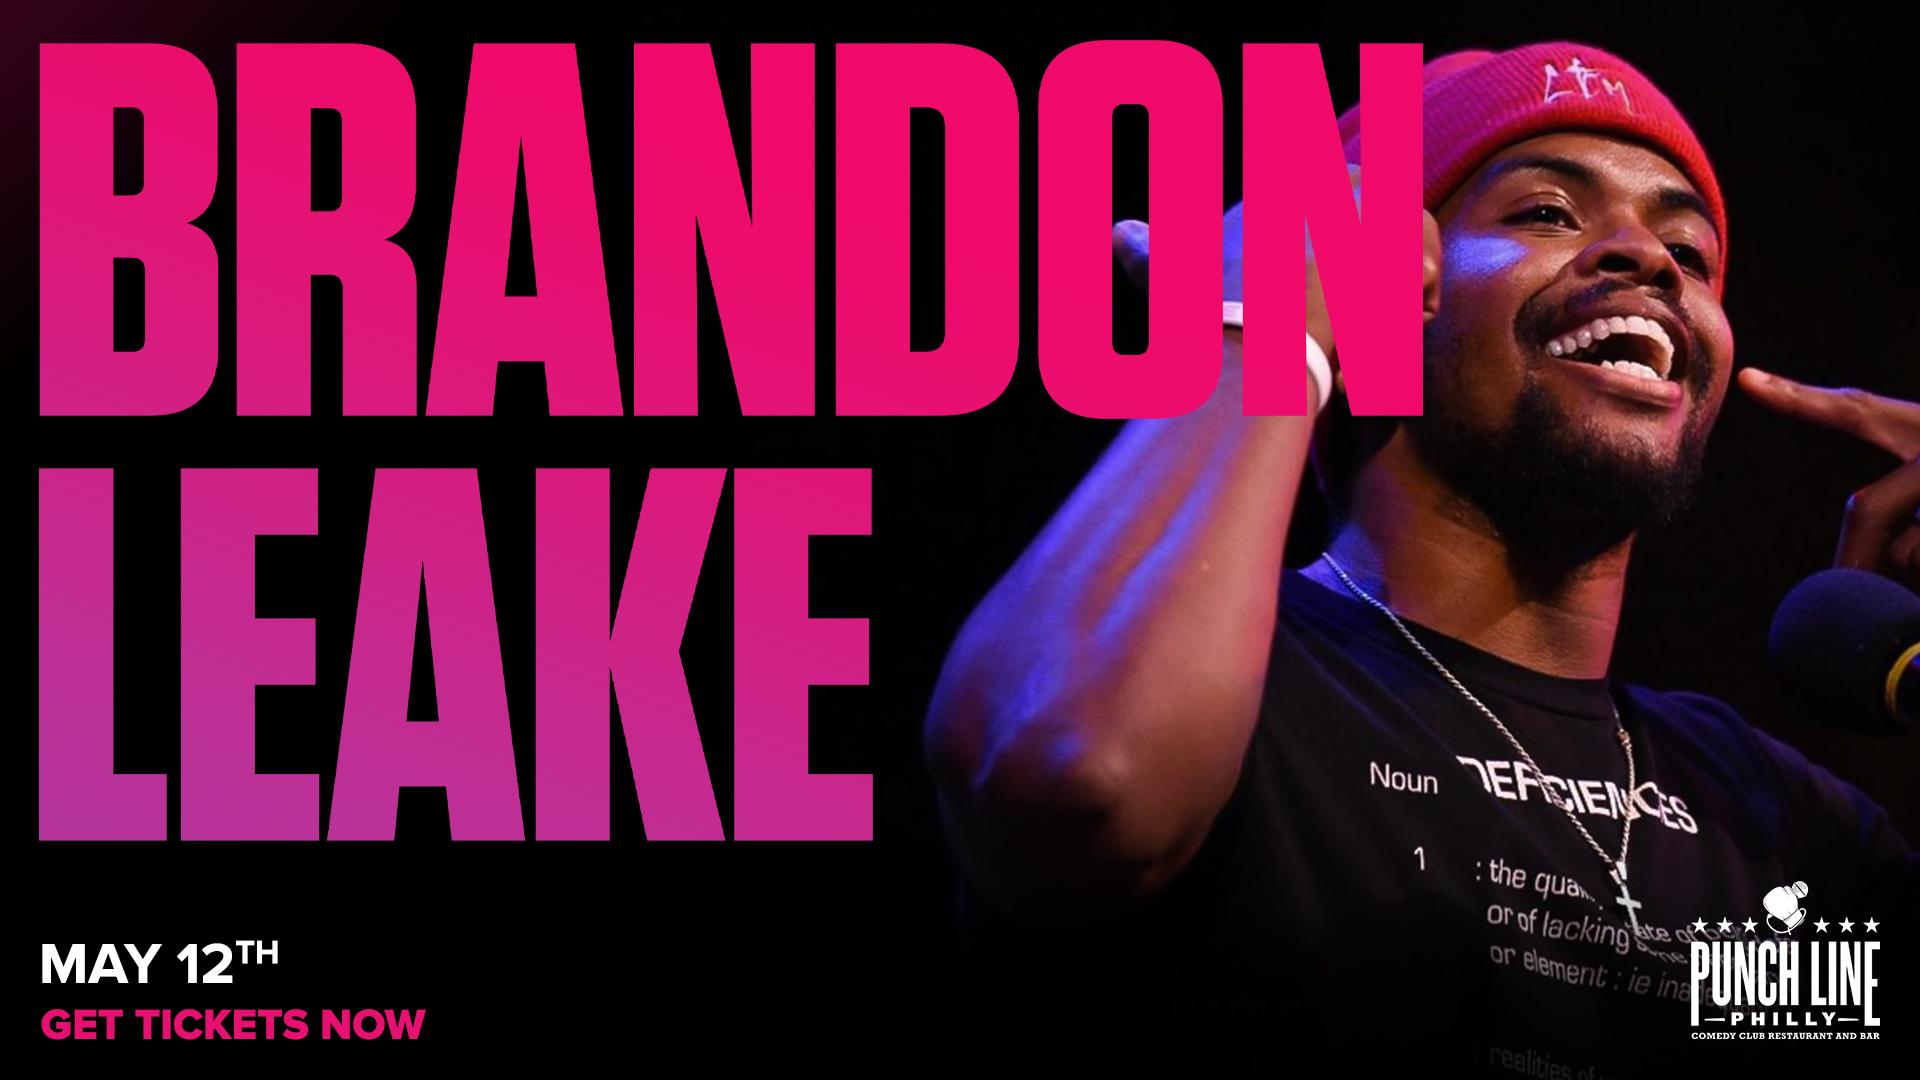 Brandon Leake